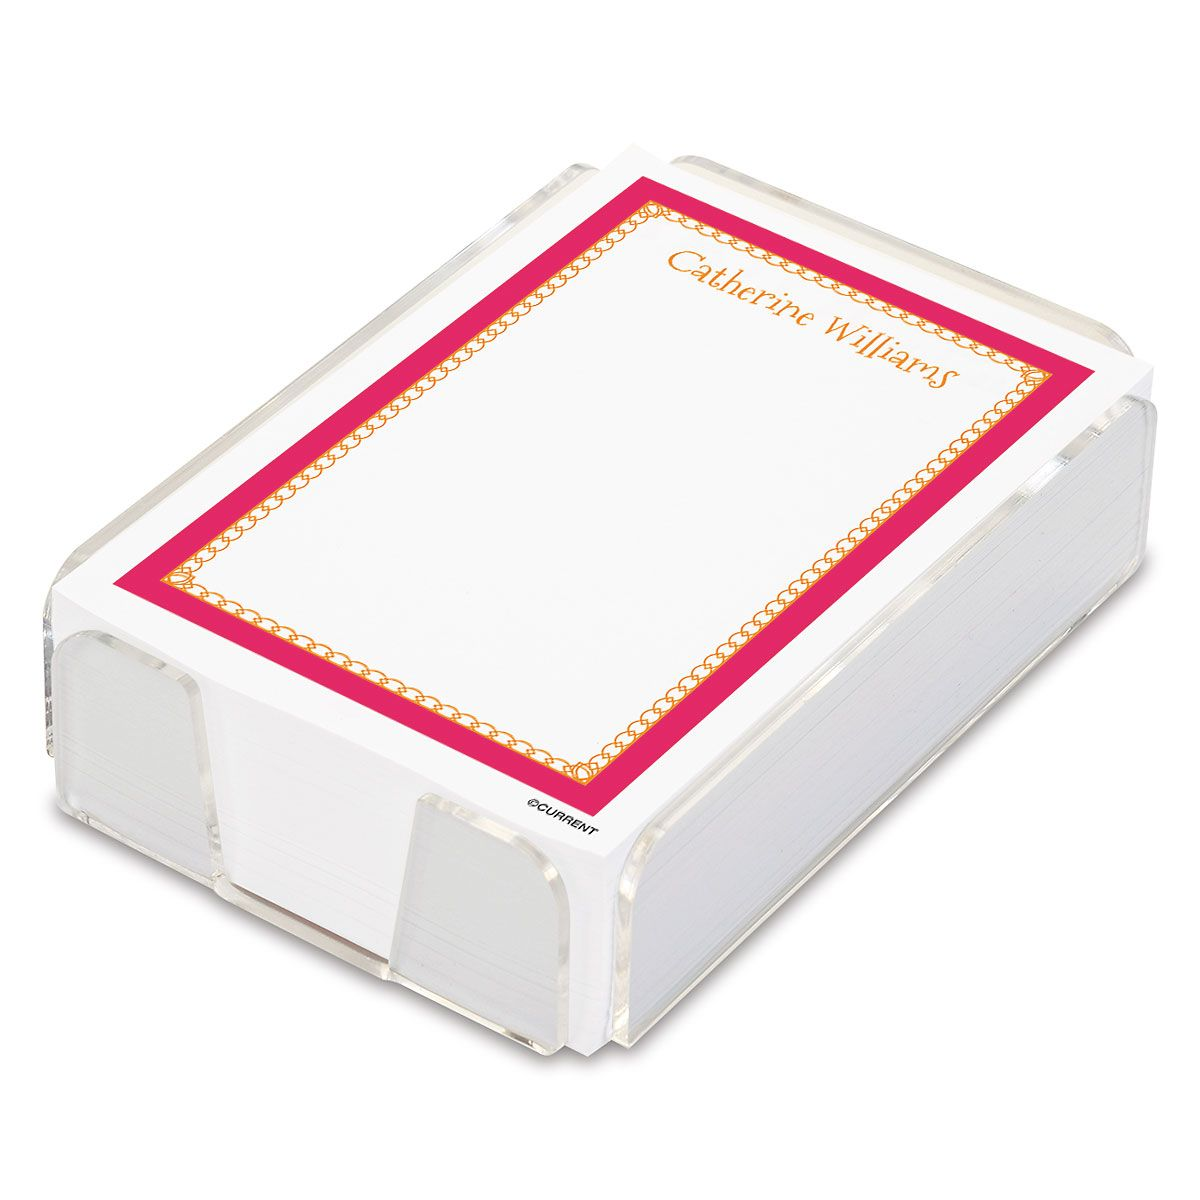 Bright Border Custom Notes Sheets in a Tray